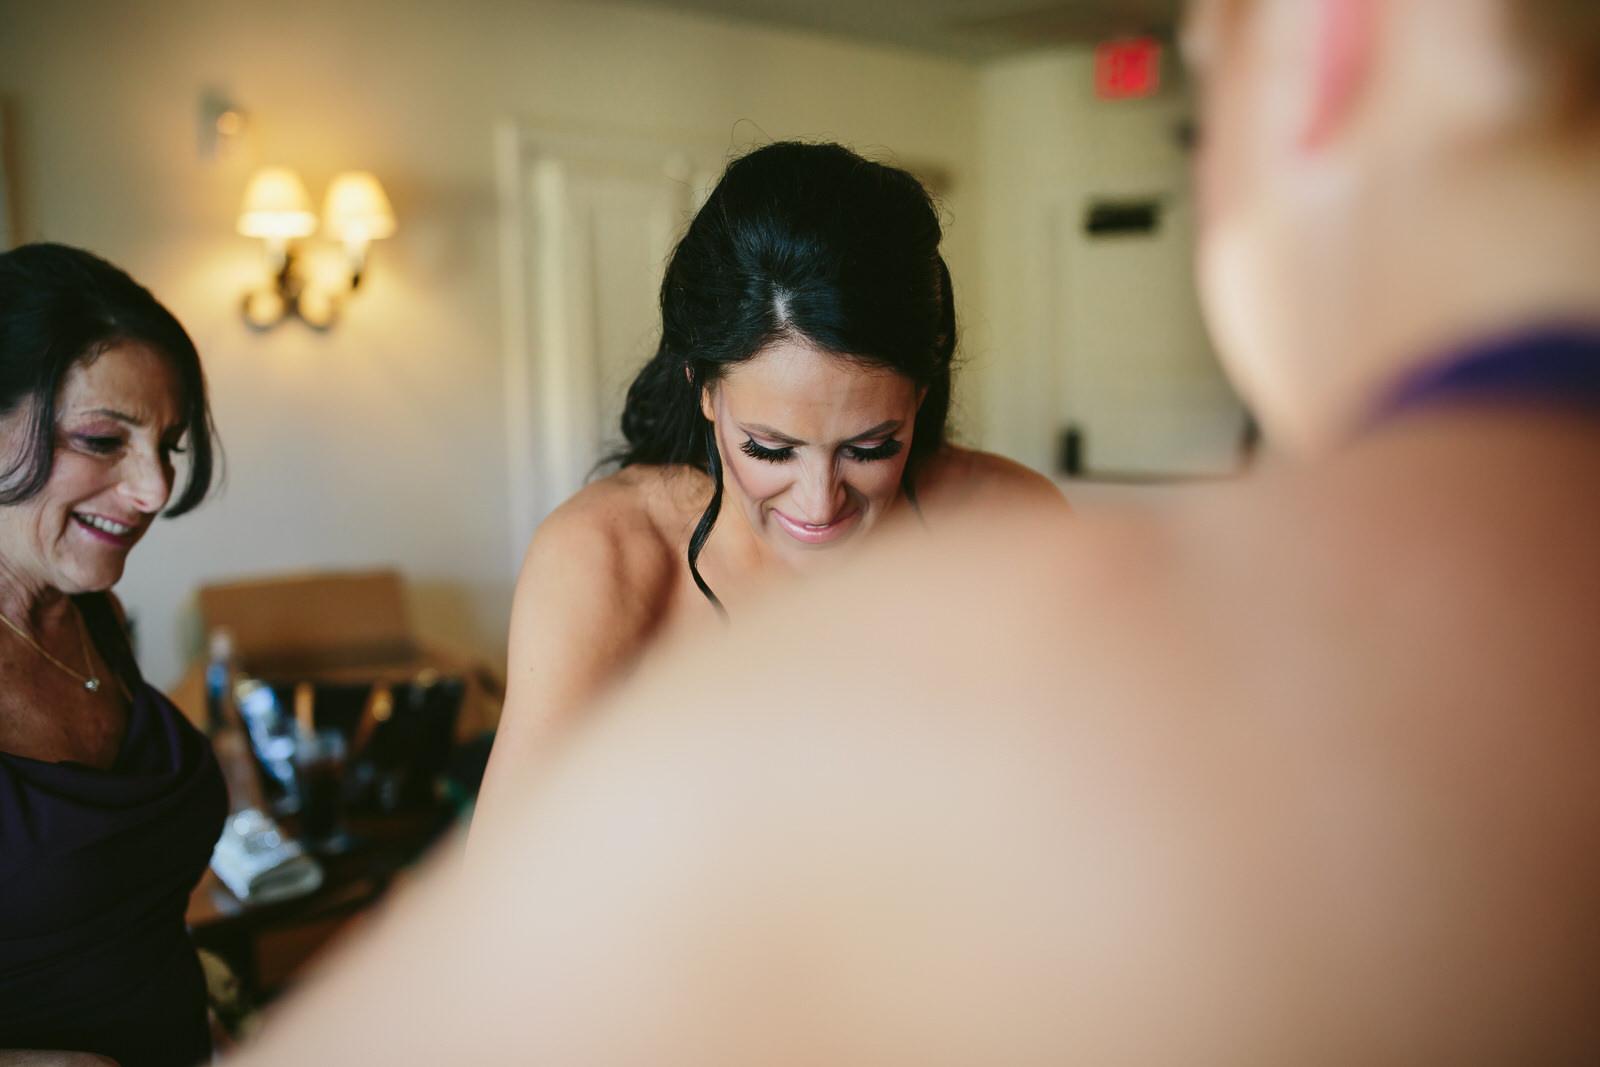 bride_getting_dressed_wedding_the_addison_tiny_house_photo.jpg